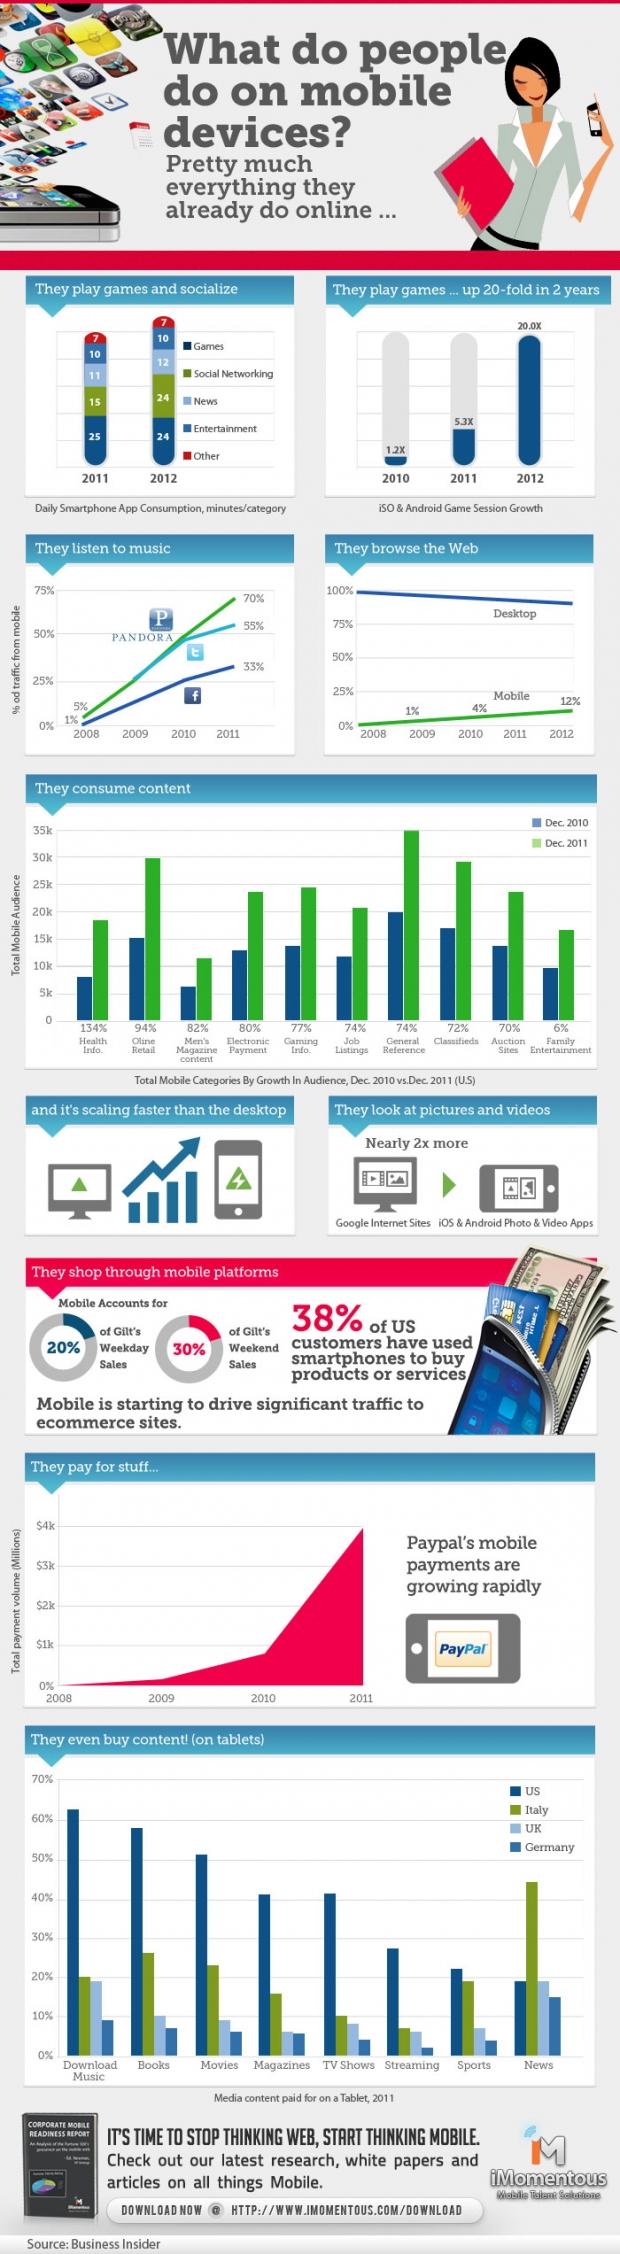 imomentous-infographic-2-620x2254